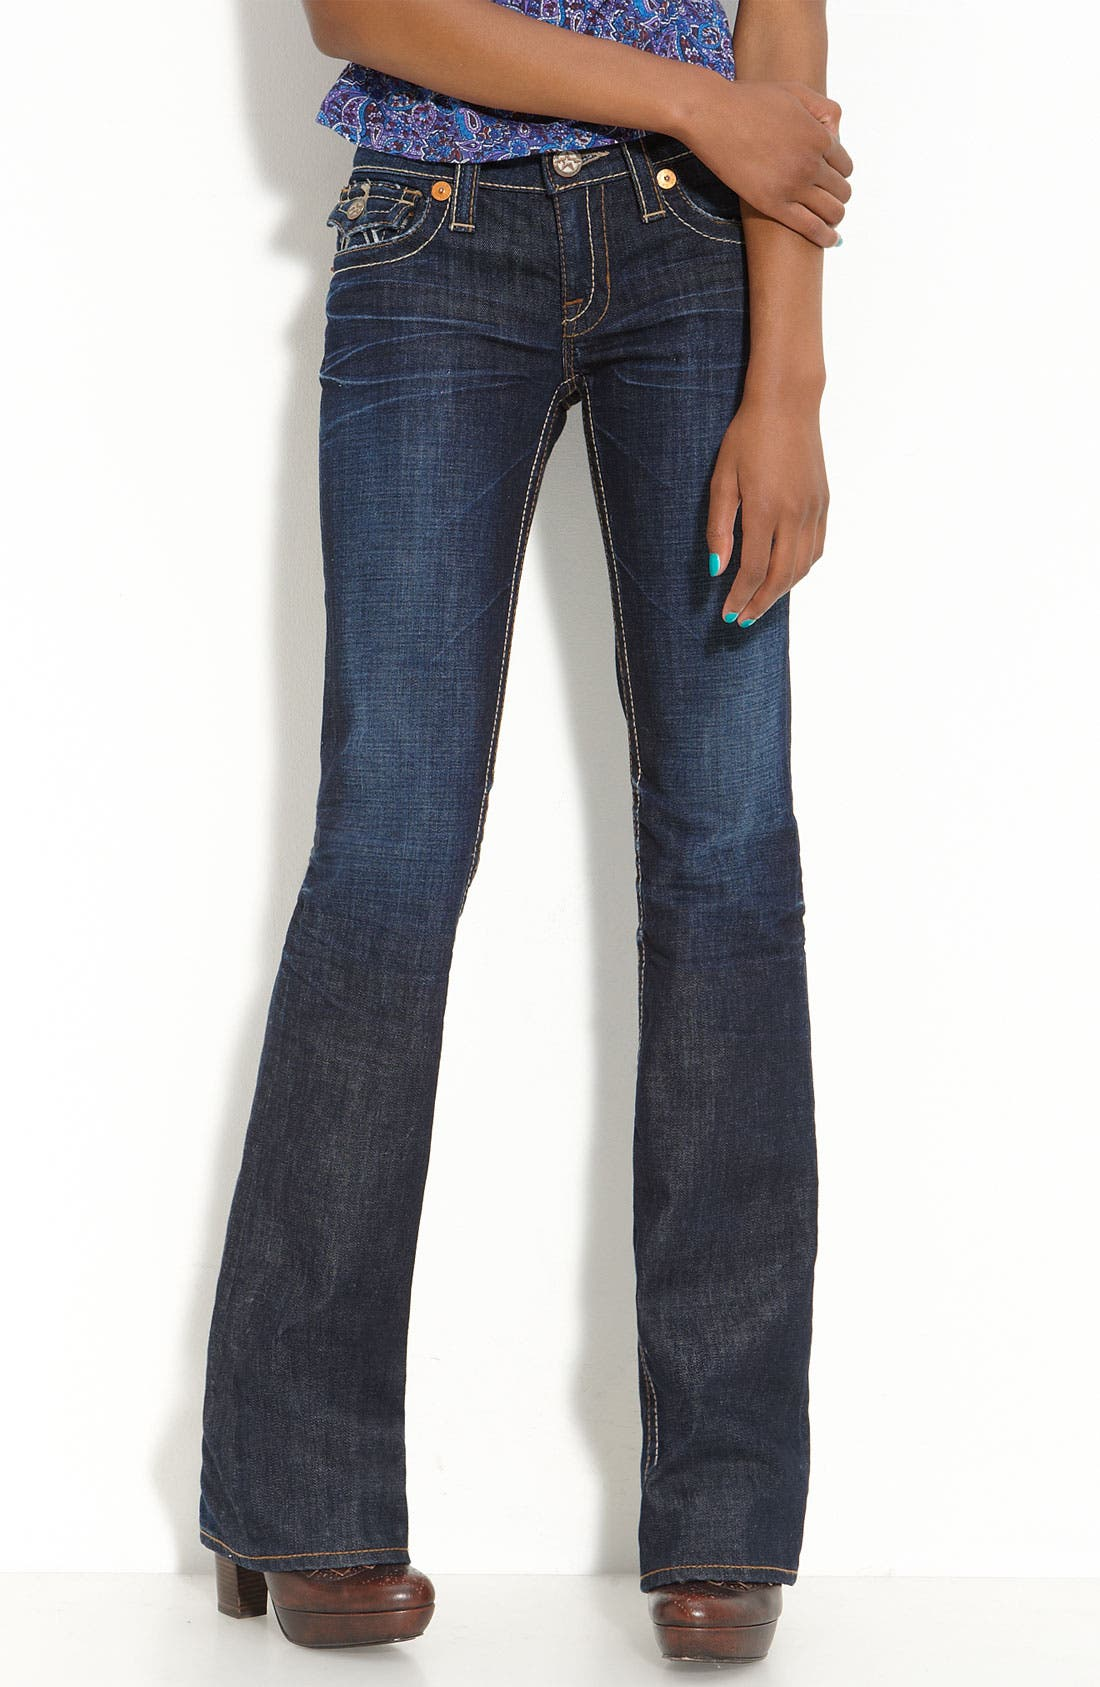 Alternate Image 1 Selected - Big Star 'Liv' Flap Pocket Bootcut Jeans (Juniors Long)